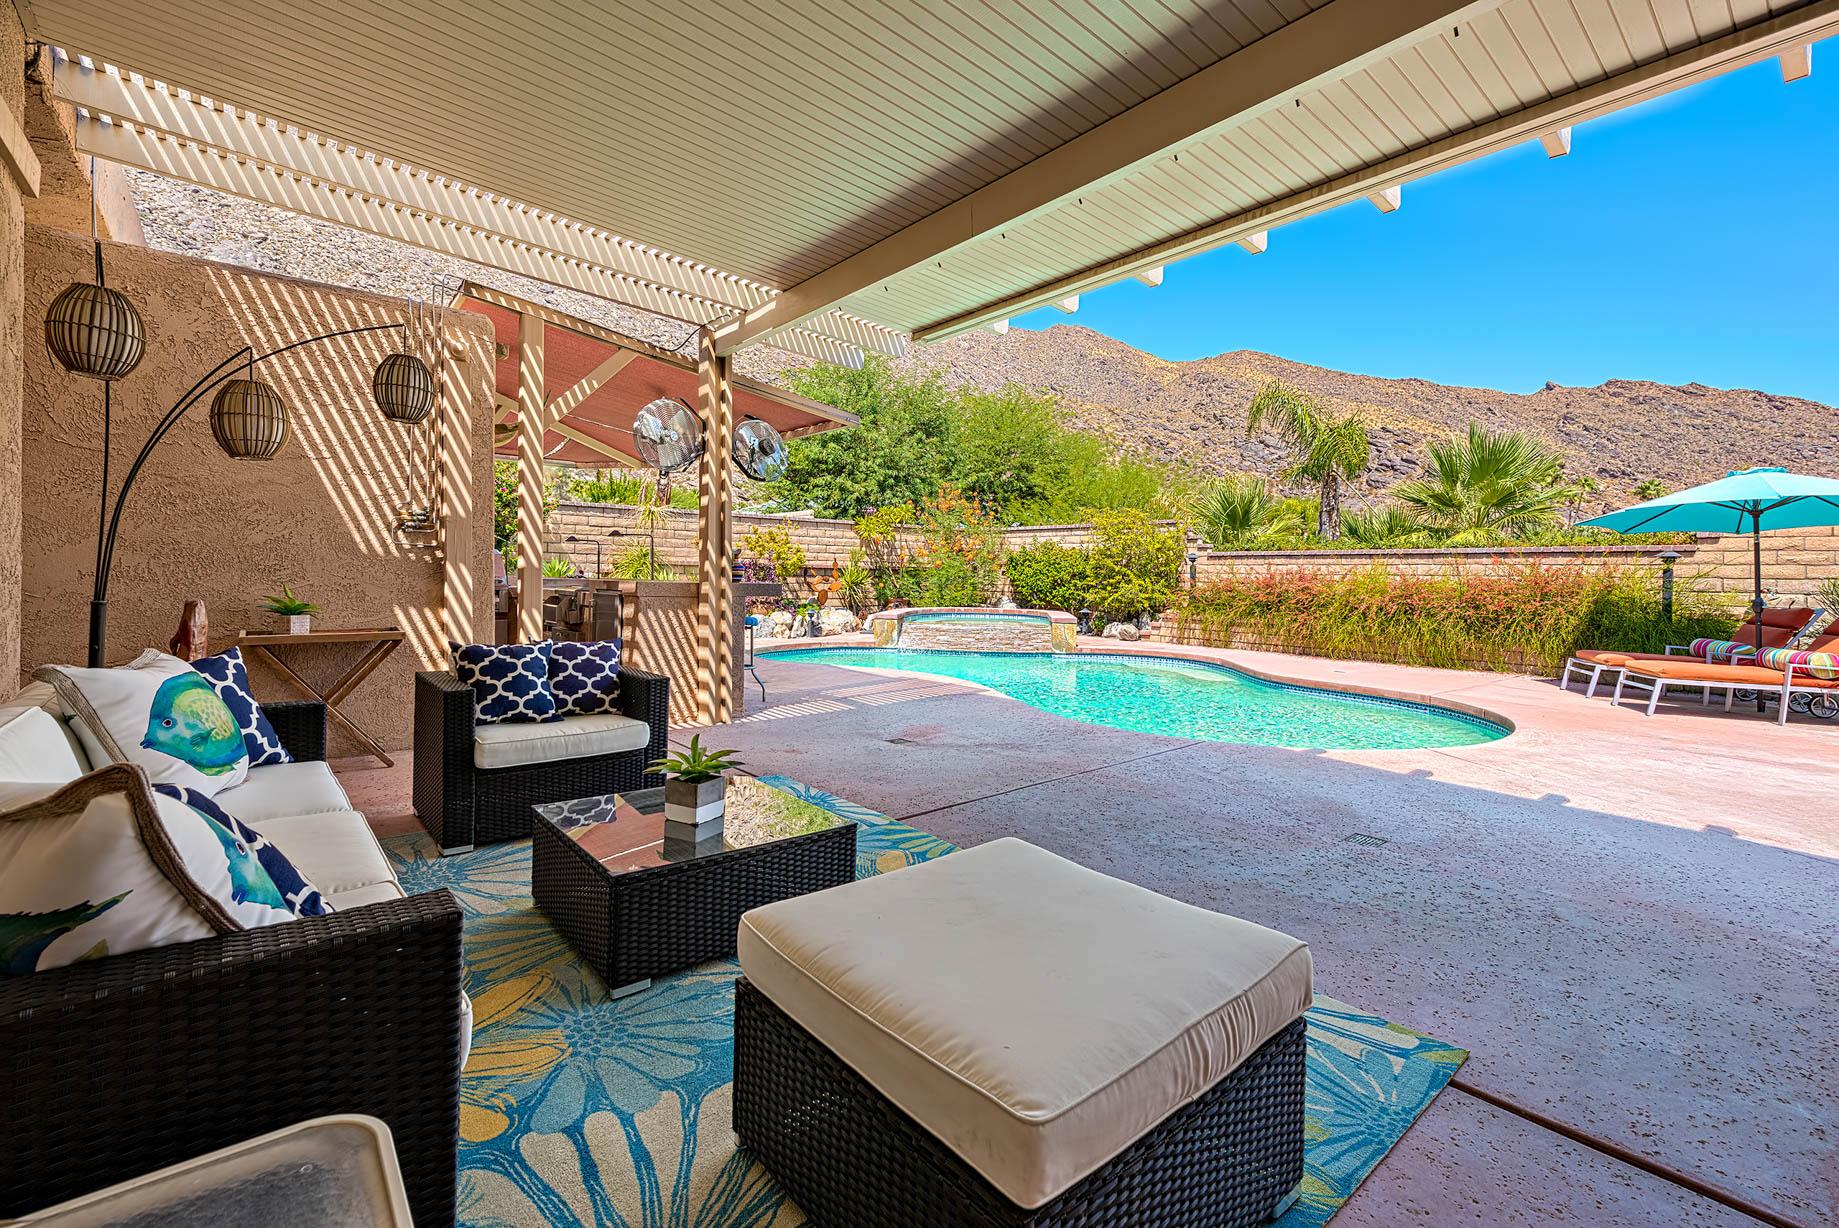 Desert Modern – 575 S Fern, Canyon Dr, Palm Springs, CA, USA